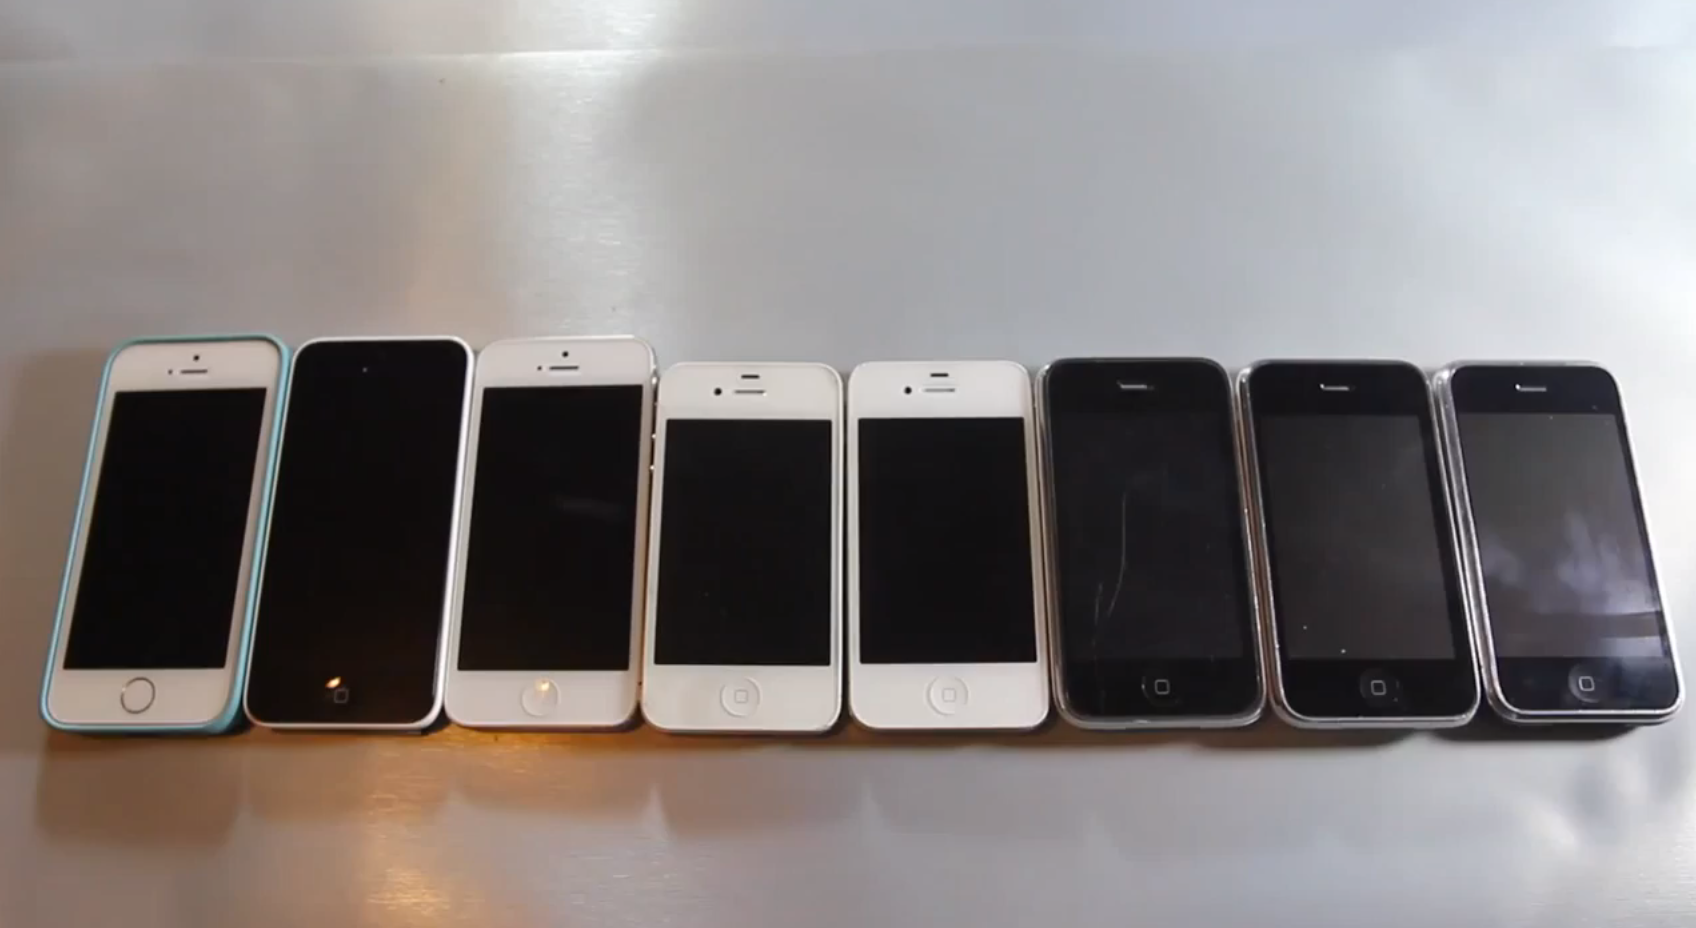 Vídeo comparando a performance de iPhones